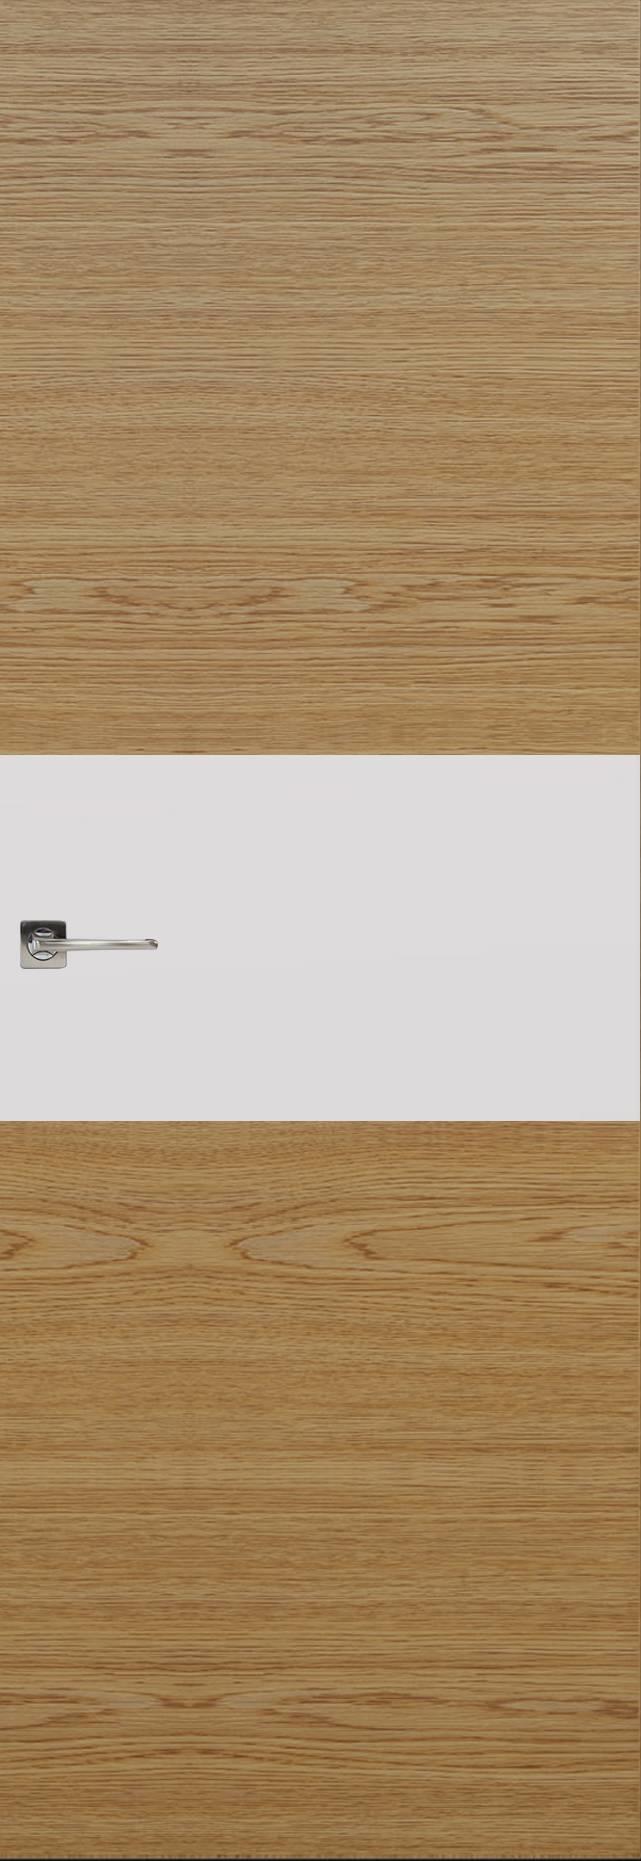 Tivoli Е-4 Невидимка цвет - Дуб карамель Без стекла (ДГ)